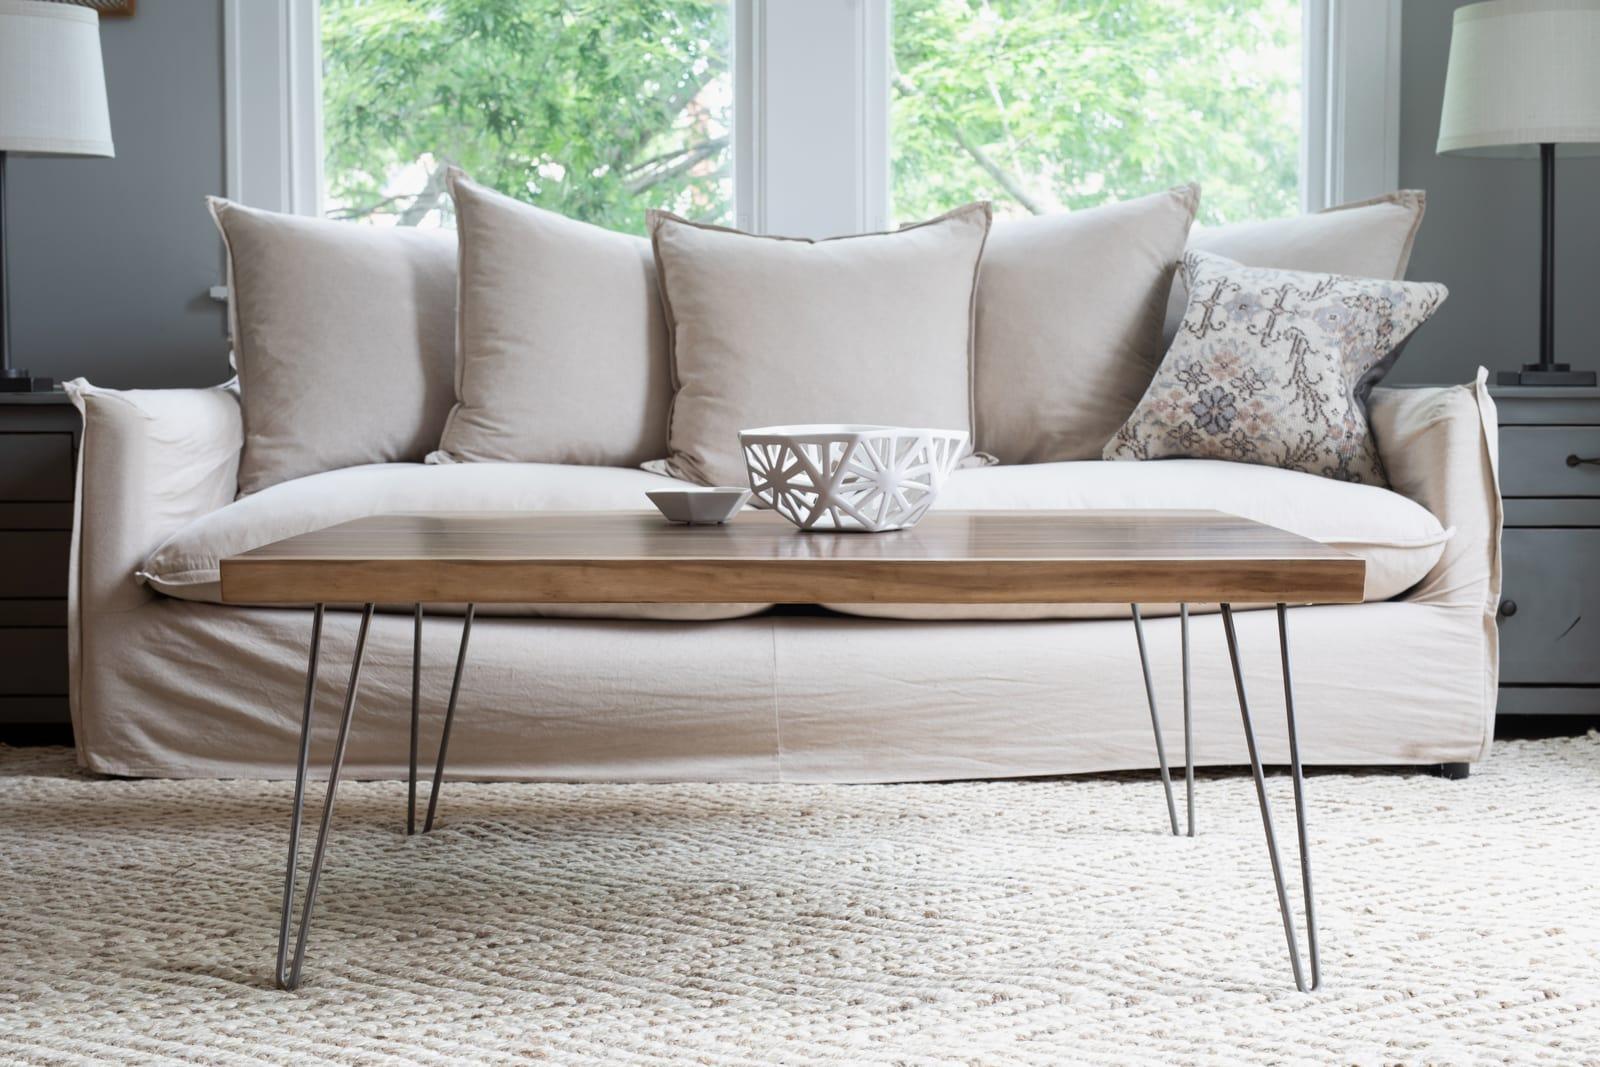 Dearborn Coffee Table | Twenty-First-Century Modern Living Room Furniture